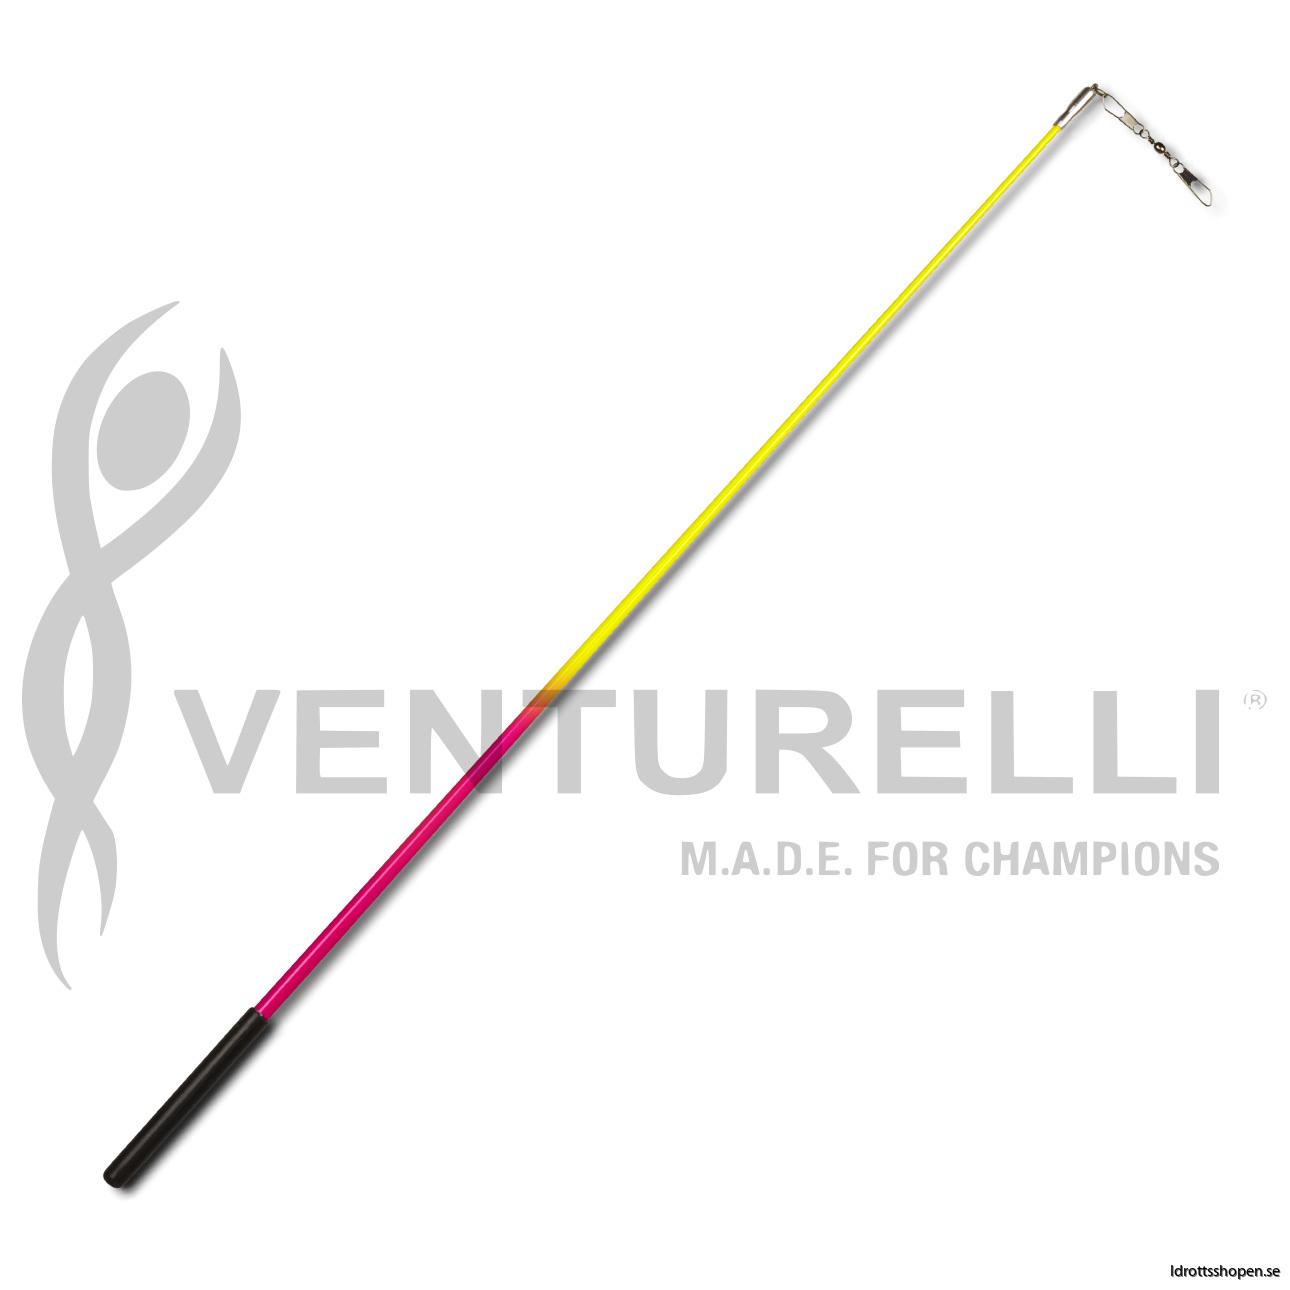 Venturelli pinne ST5916 neon rosa gul